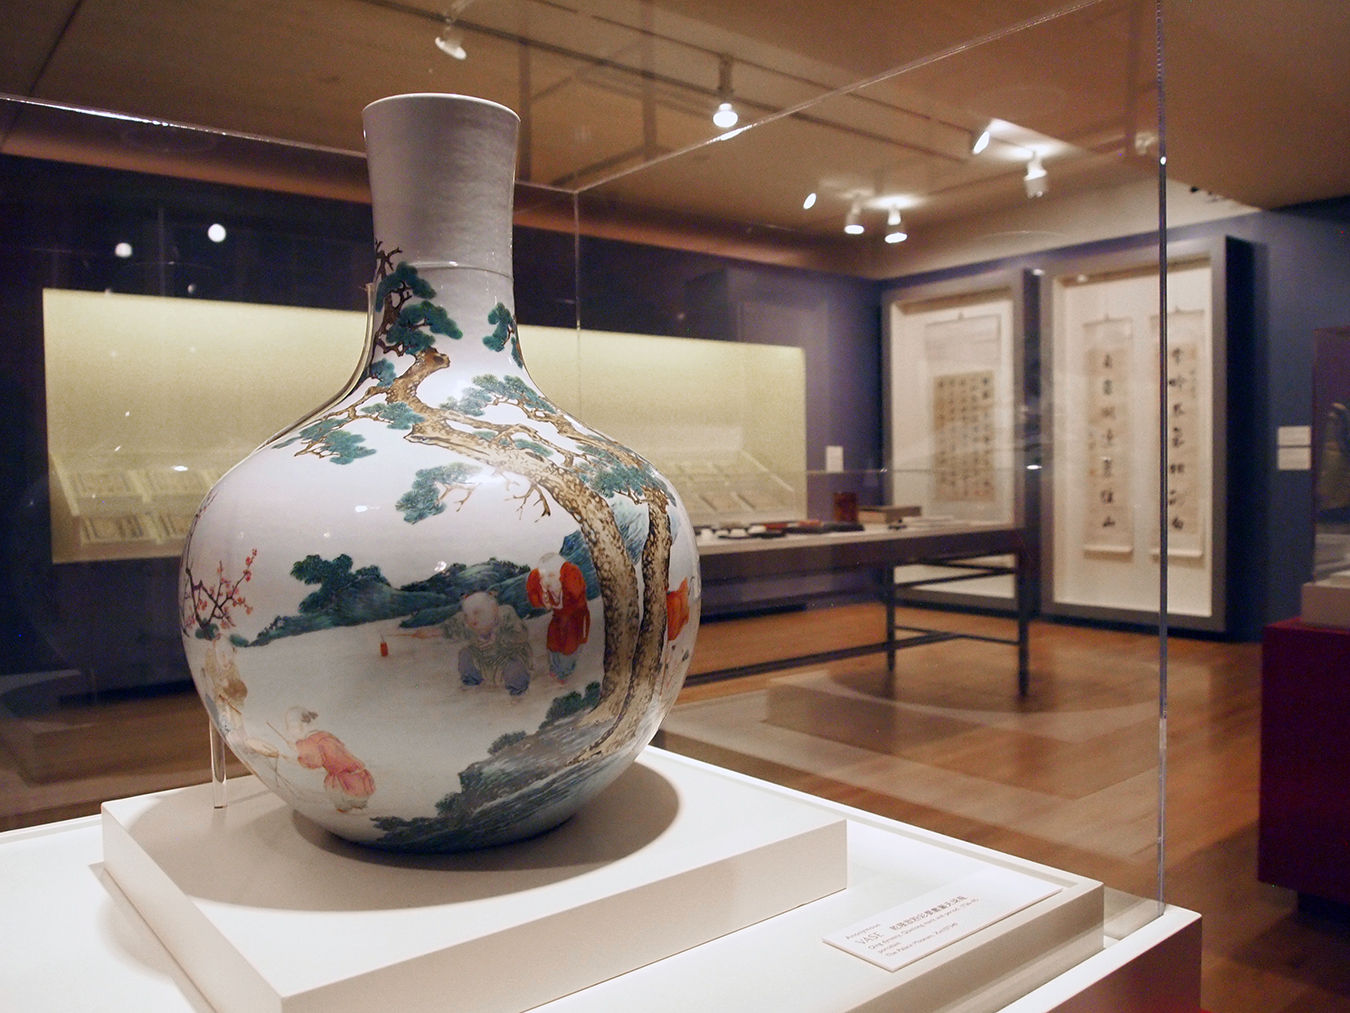 MONTECRISTO Blog: The Forbidden City at the Vancouver Art Gallery